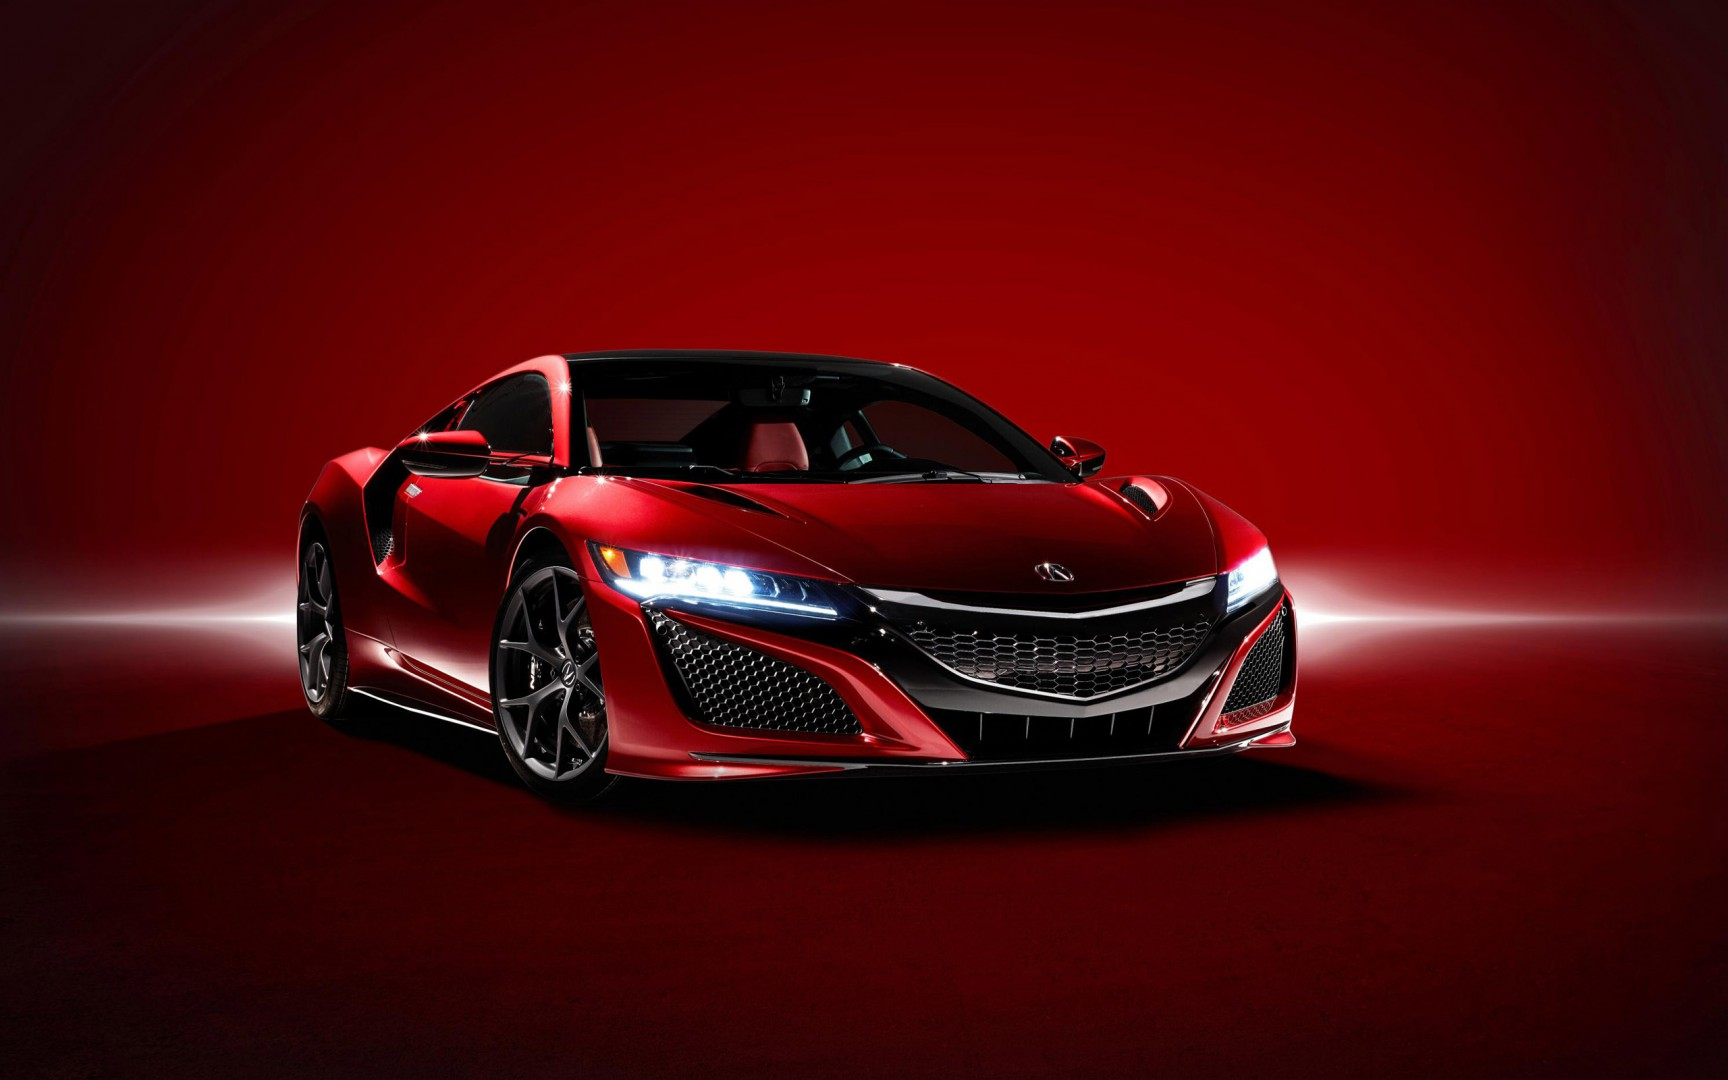 2016 Acura NSX Supercar Car HD Wallpaper FullHDWpp   Full HD 1728x1080